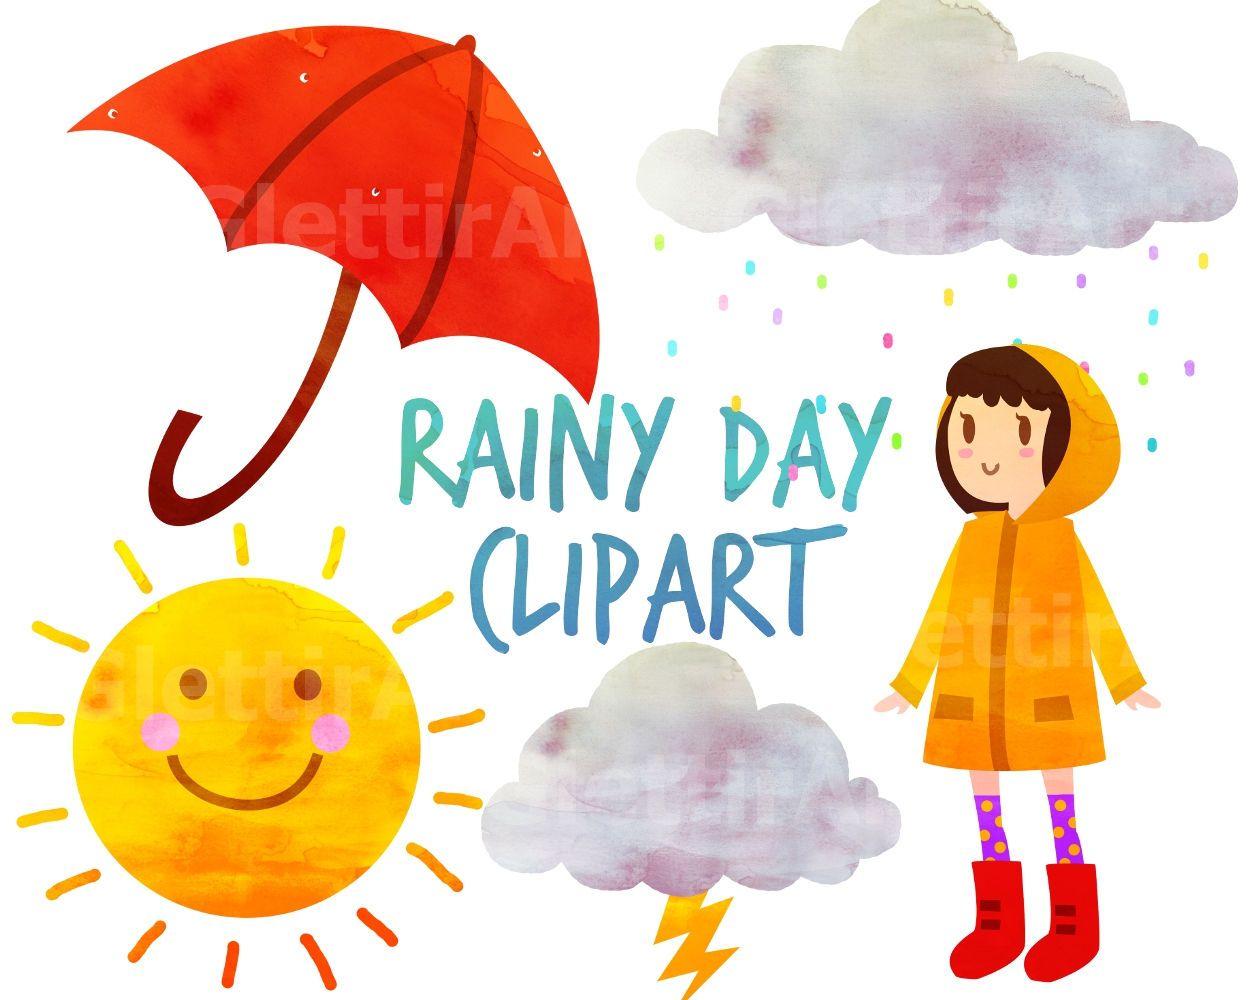 Rainy Day Clipart Weather Clipart Umbrella Clipart For Etsy In 2021 Weather Clipart Clip Art Rainy Day